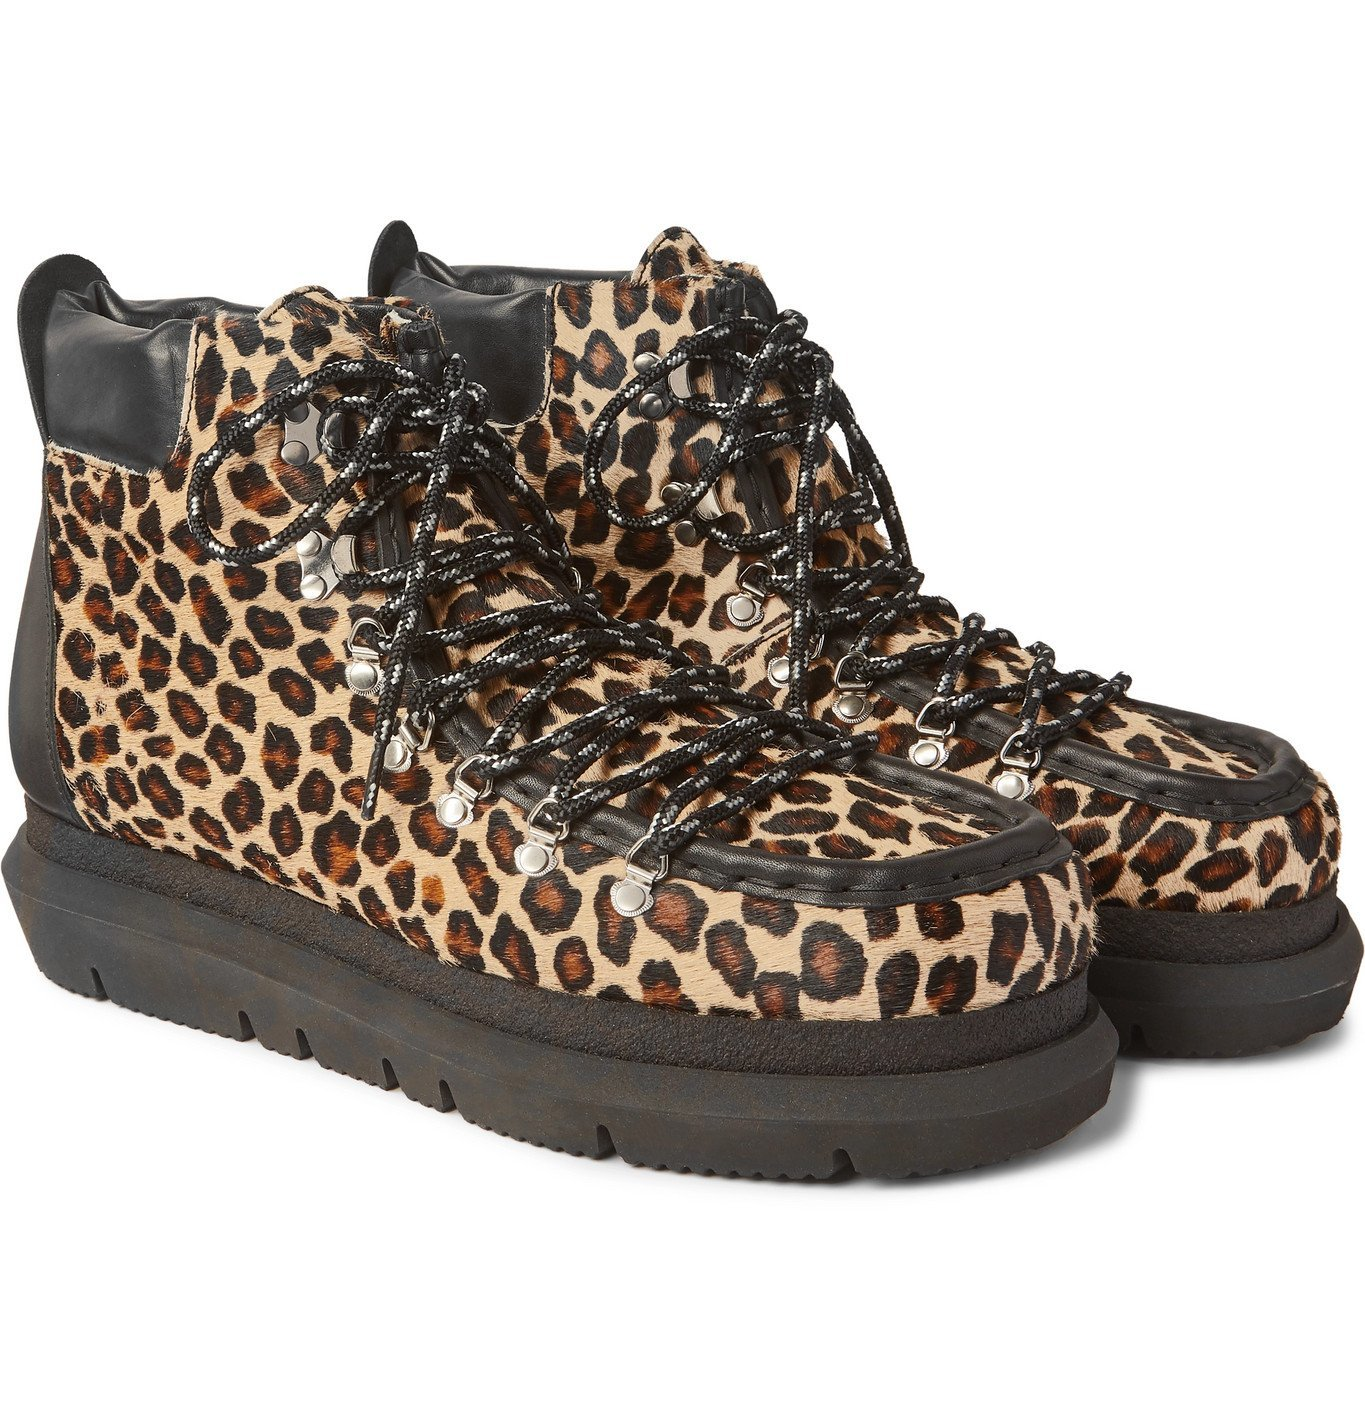 Sacai - Leopard-Print Leather-Trimmed Calf Hair Boots - Brown